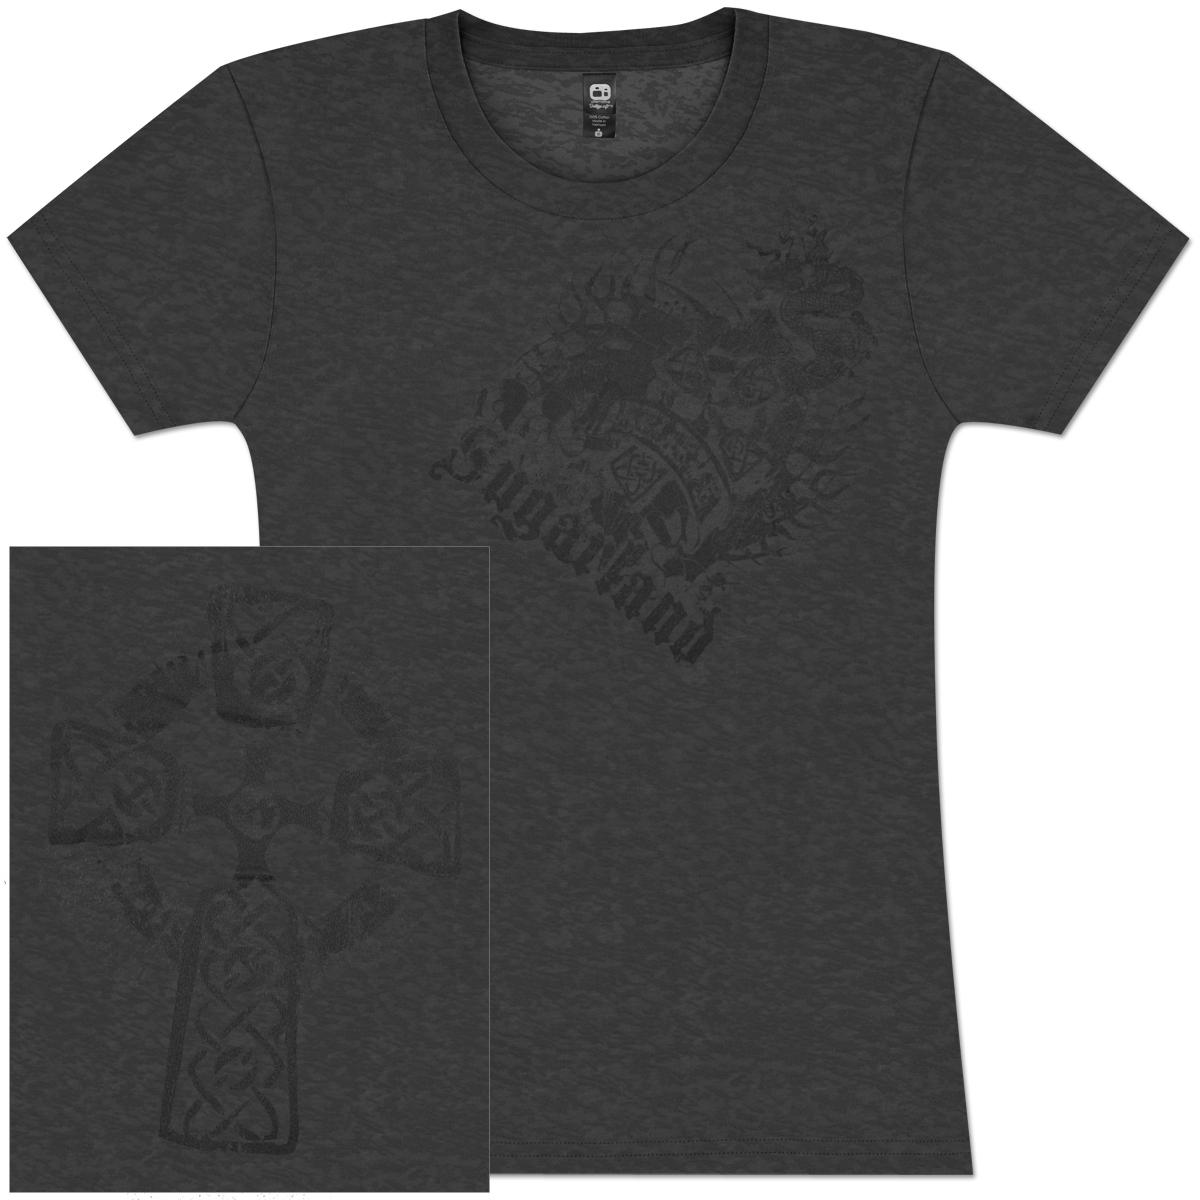 Sugarland Believe Cross Youth Girls T-Shirt